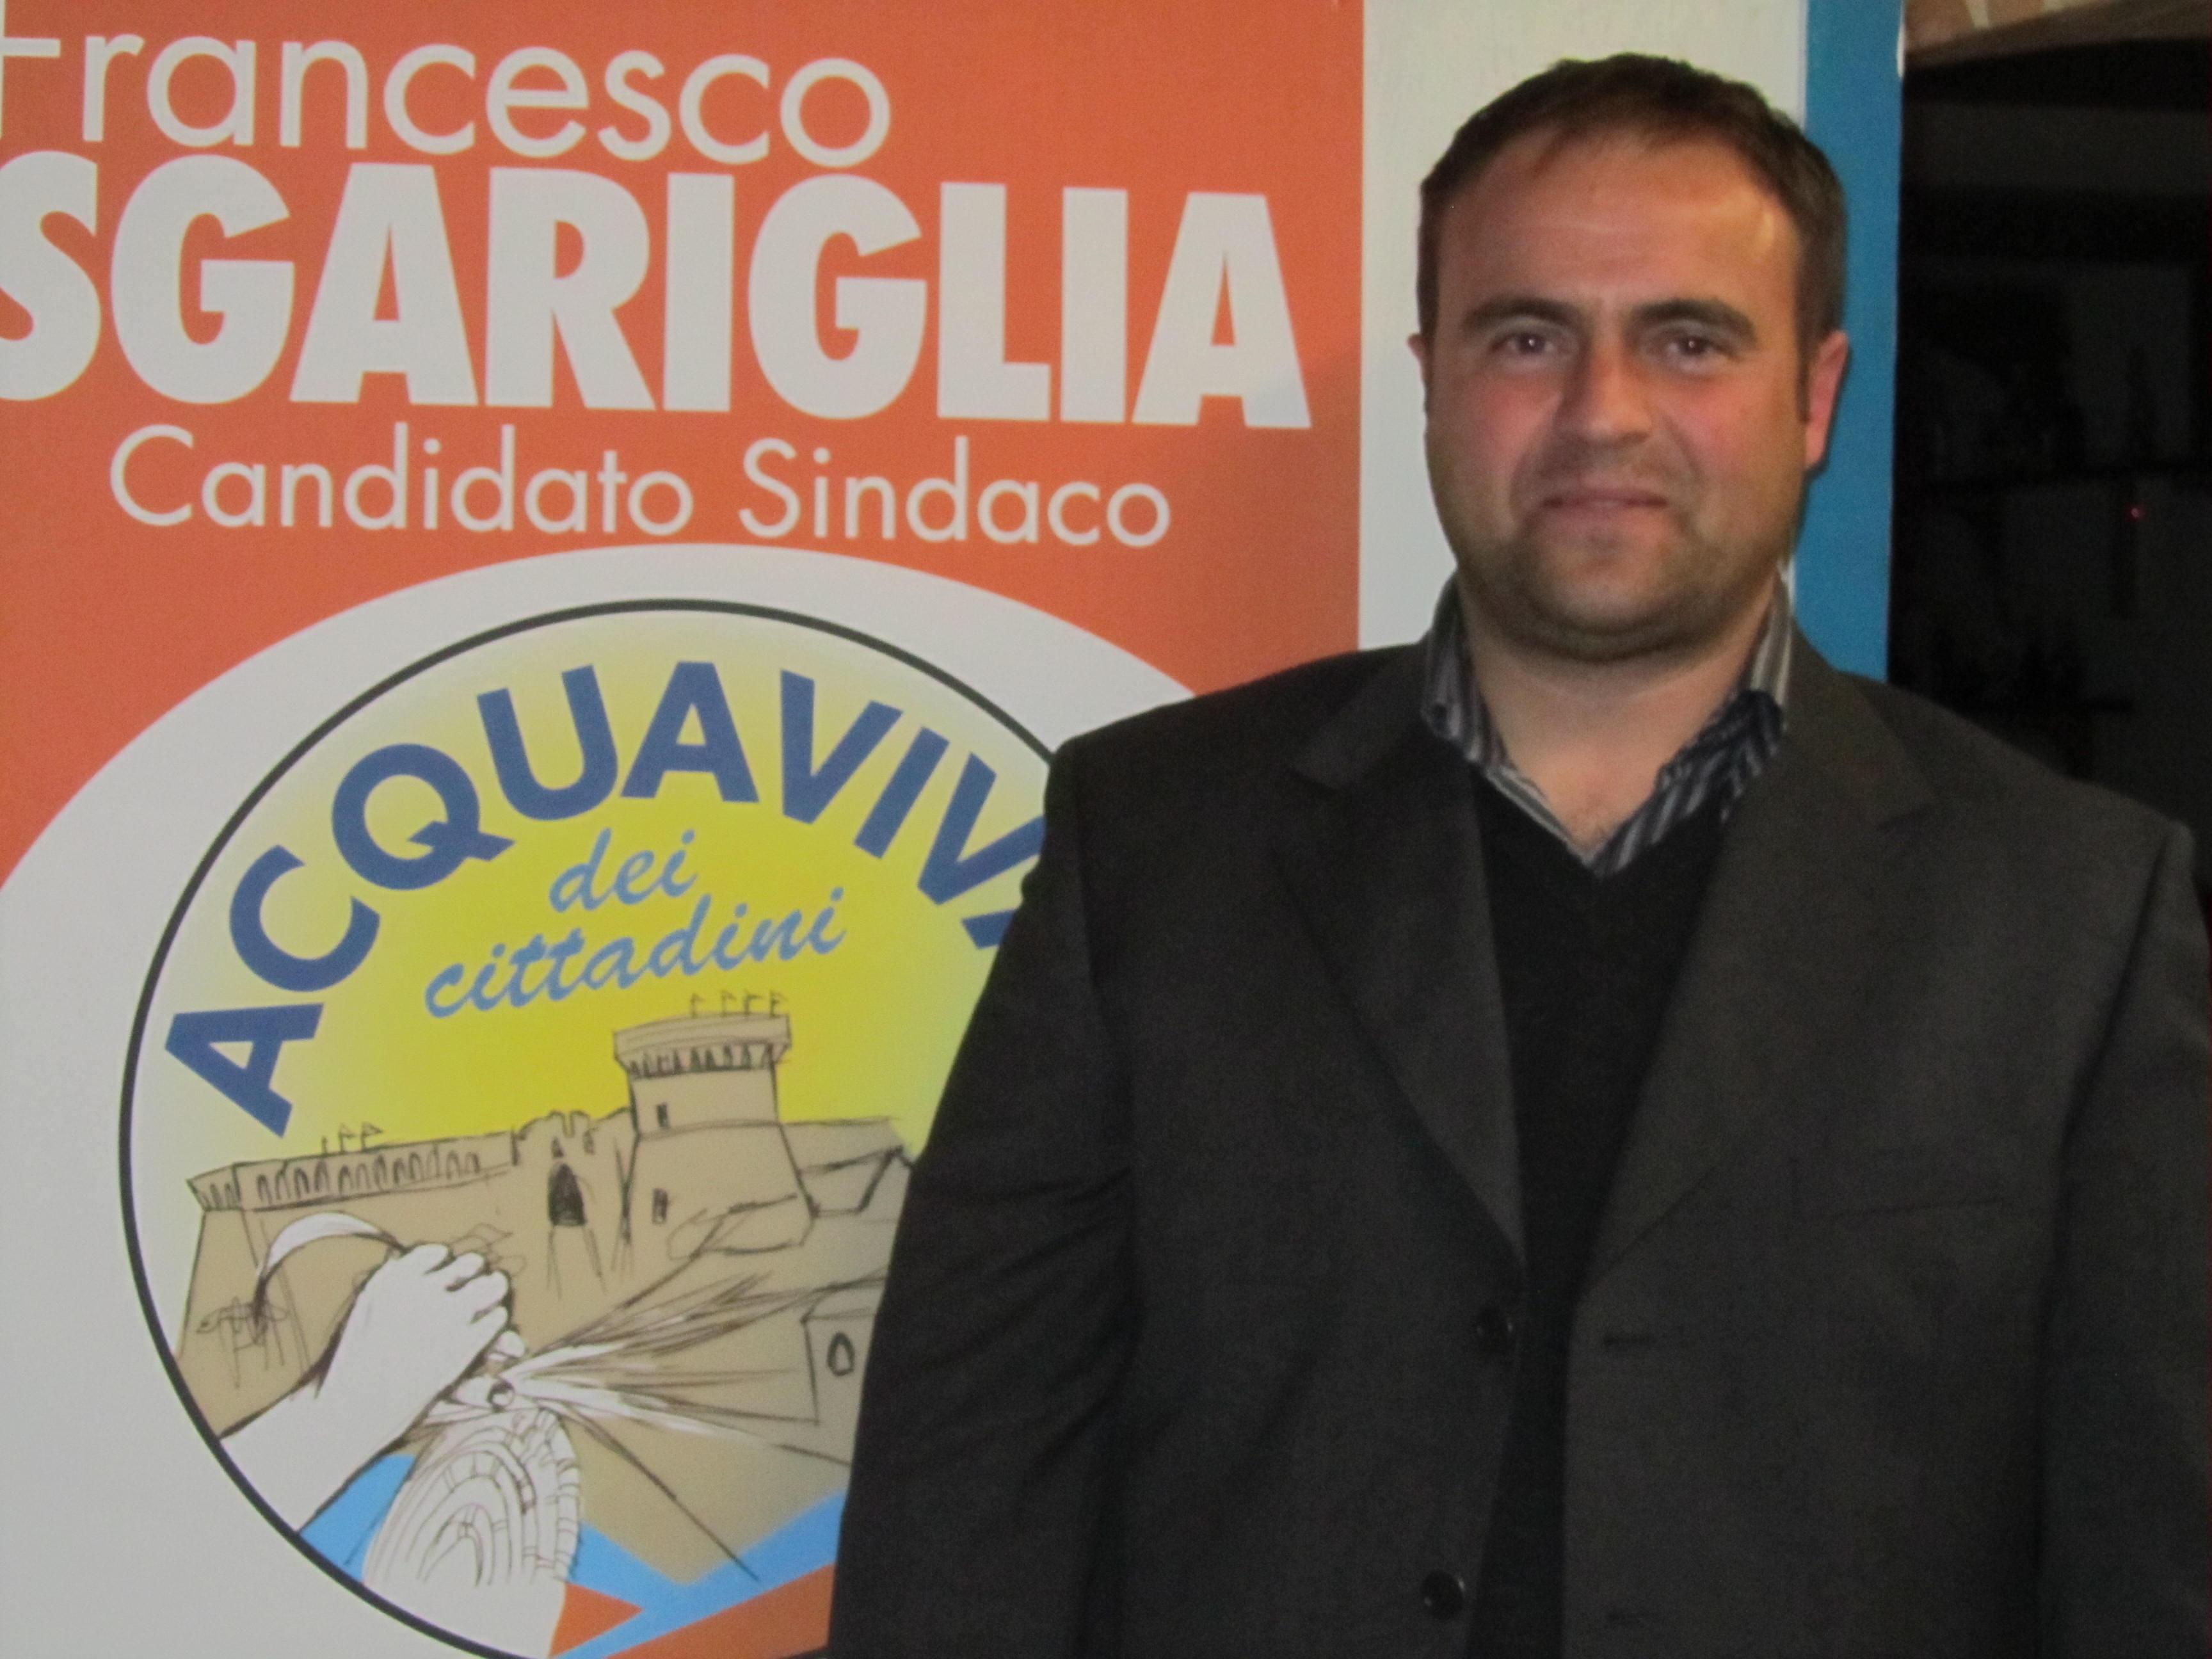 Francesco Sgariglia